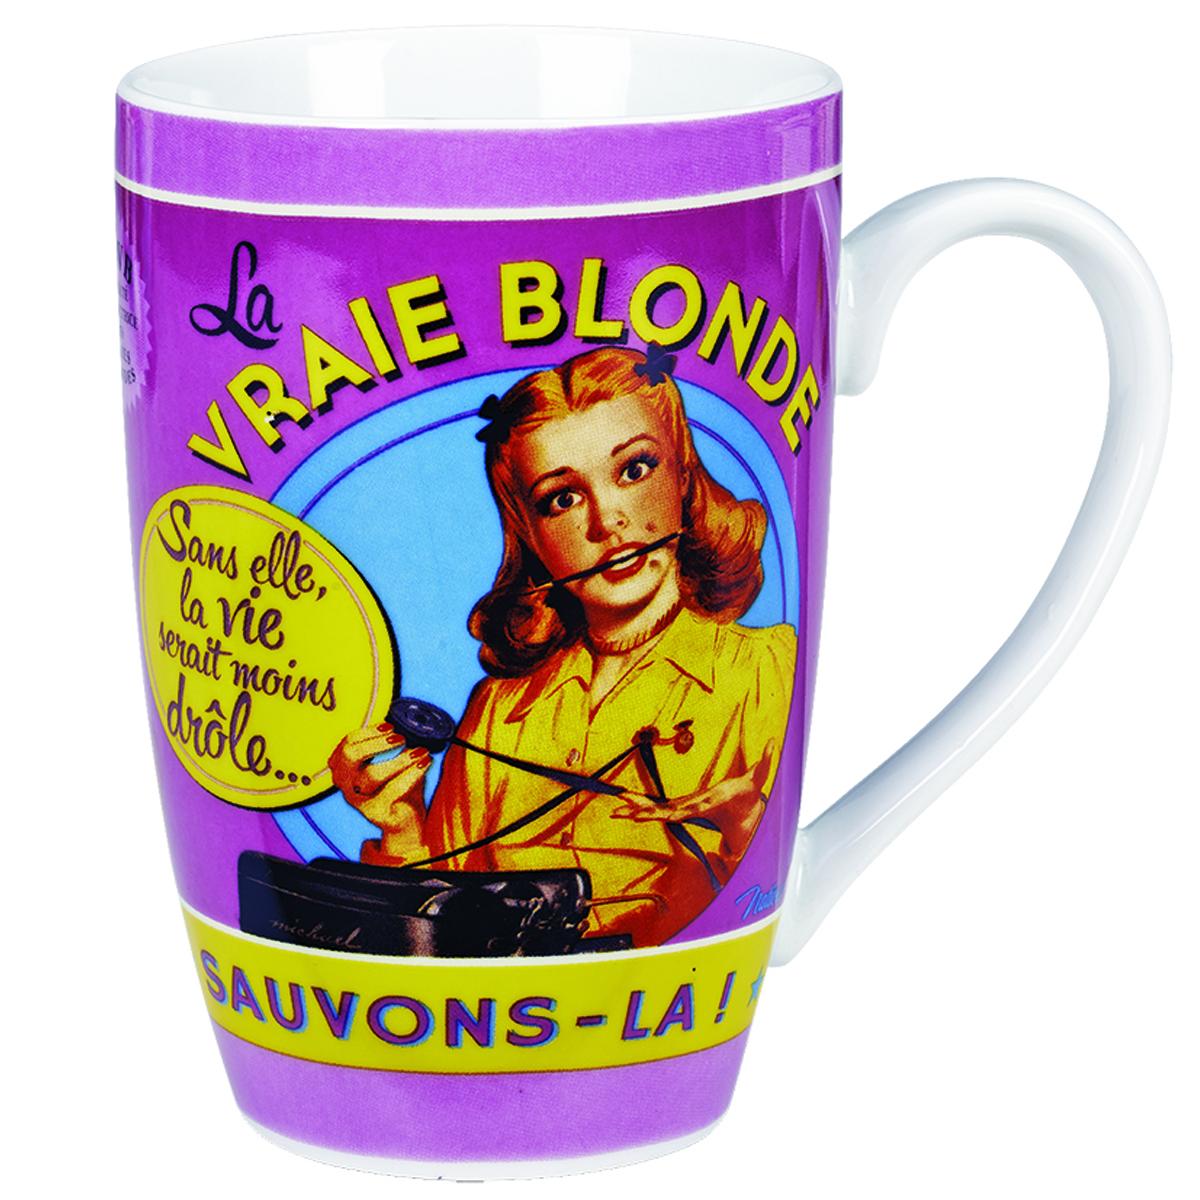 Grand mug porcelaine \'French Vintage\' (La Vraie Blonde ) - 13x85 cm (46cl) - [Q6973]